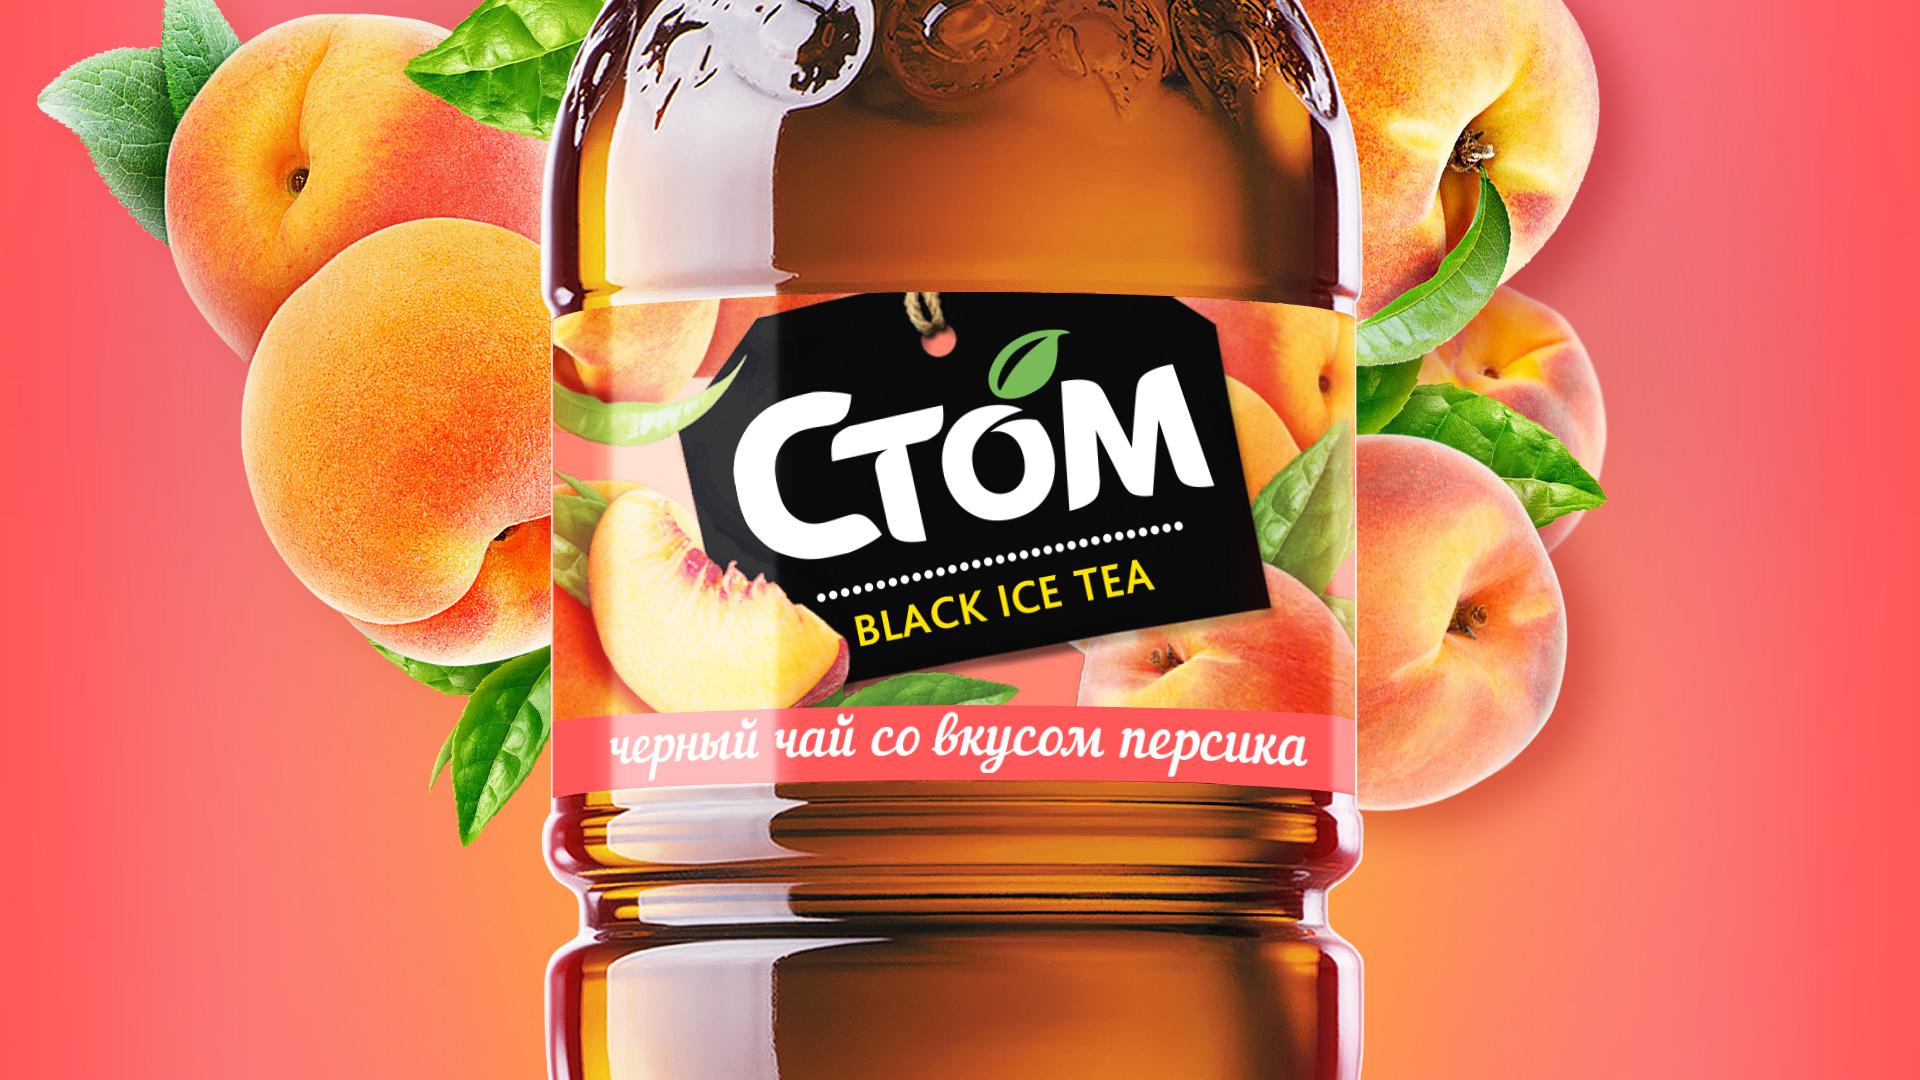 Rebranding, chmw, ice tea, stom tea, trade mark design, label design, Asgard, peach, pink, персик, чай